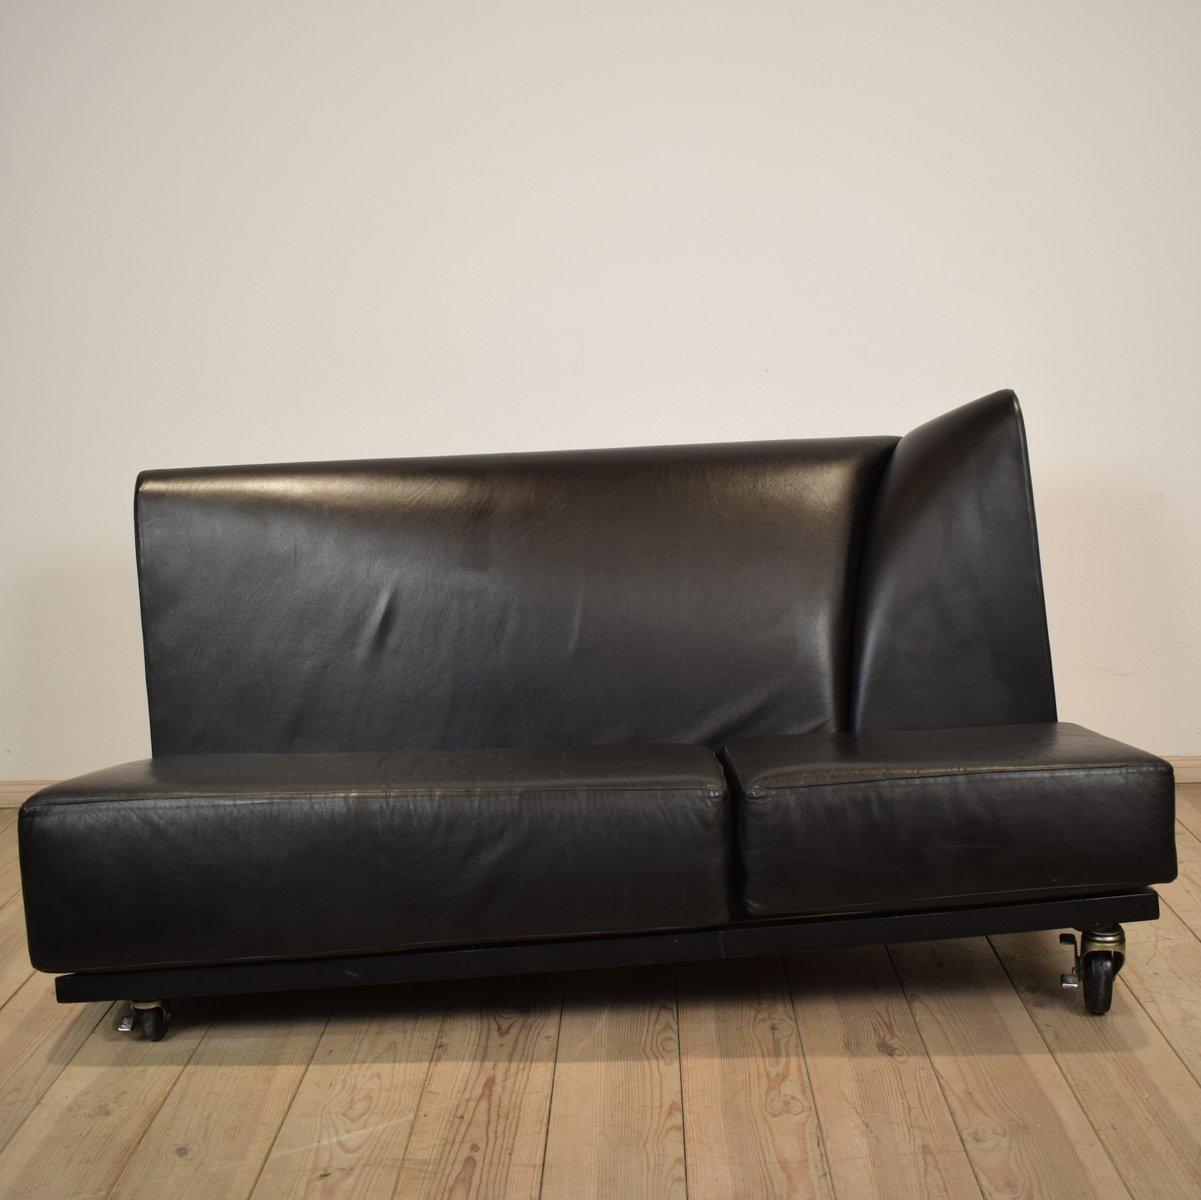 schwarzes ledersofa von pallucco m rivier f r pallucco. Black Bedroom Furniture Sets. Home Design Ideas